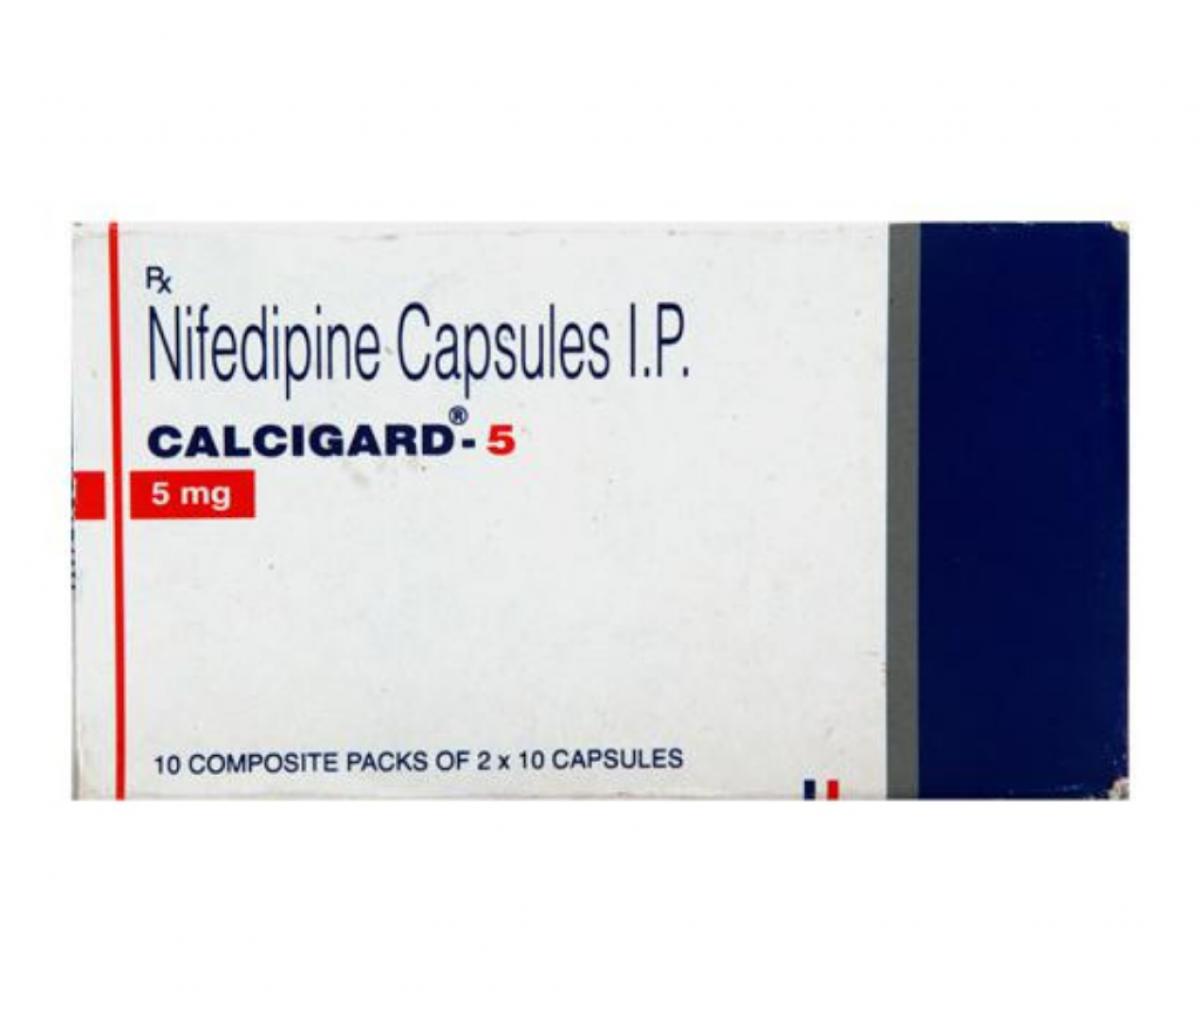 Calcigard 5mg Soft Gelatin Capsule